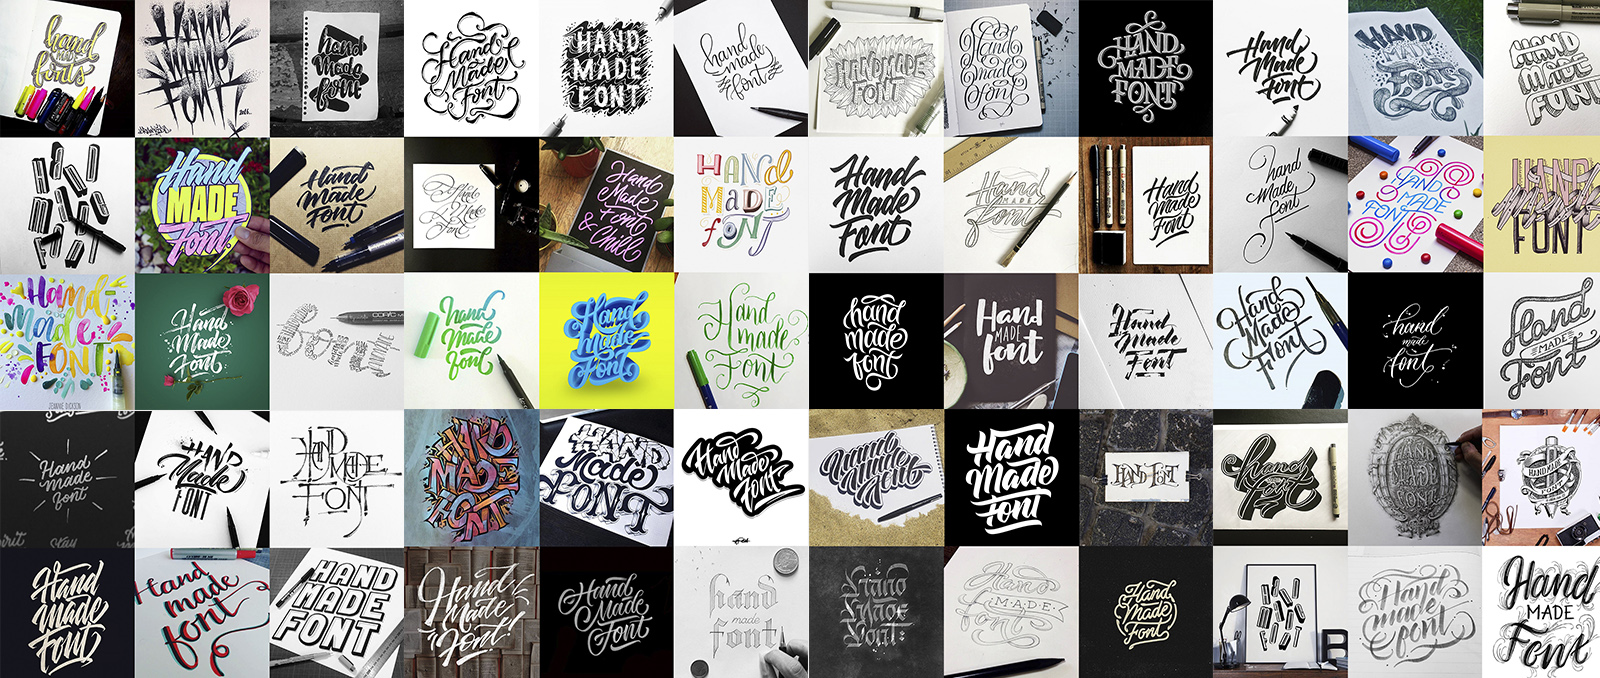 Handmadefont logos